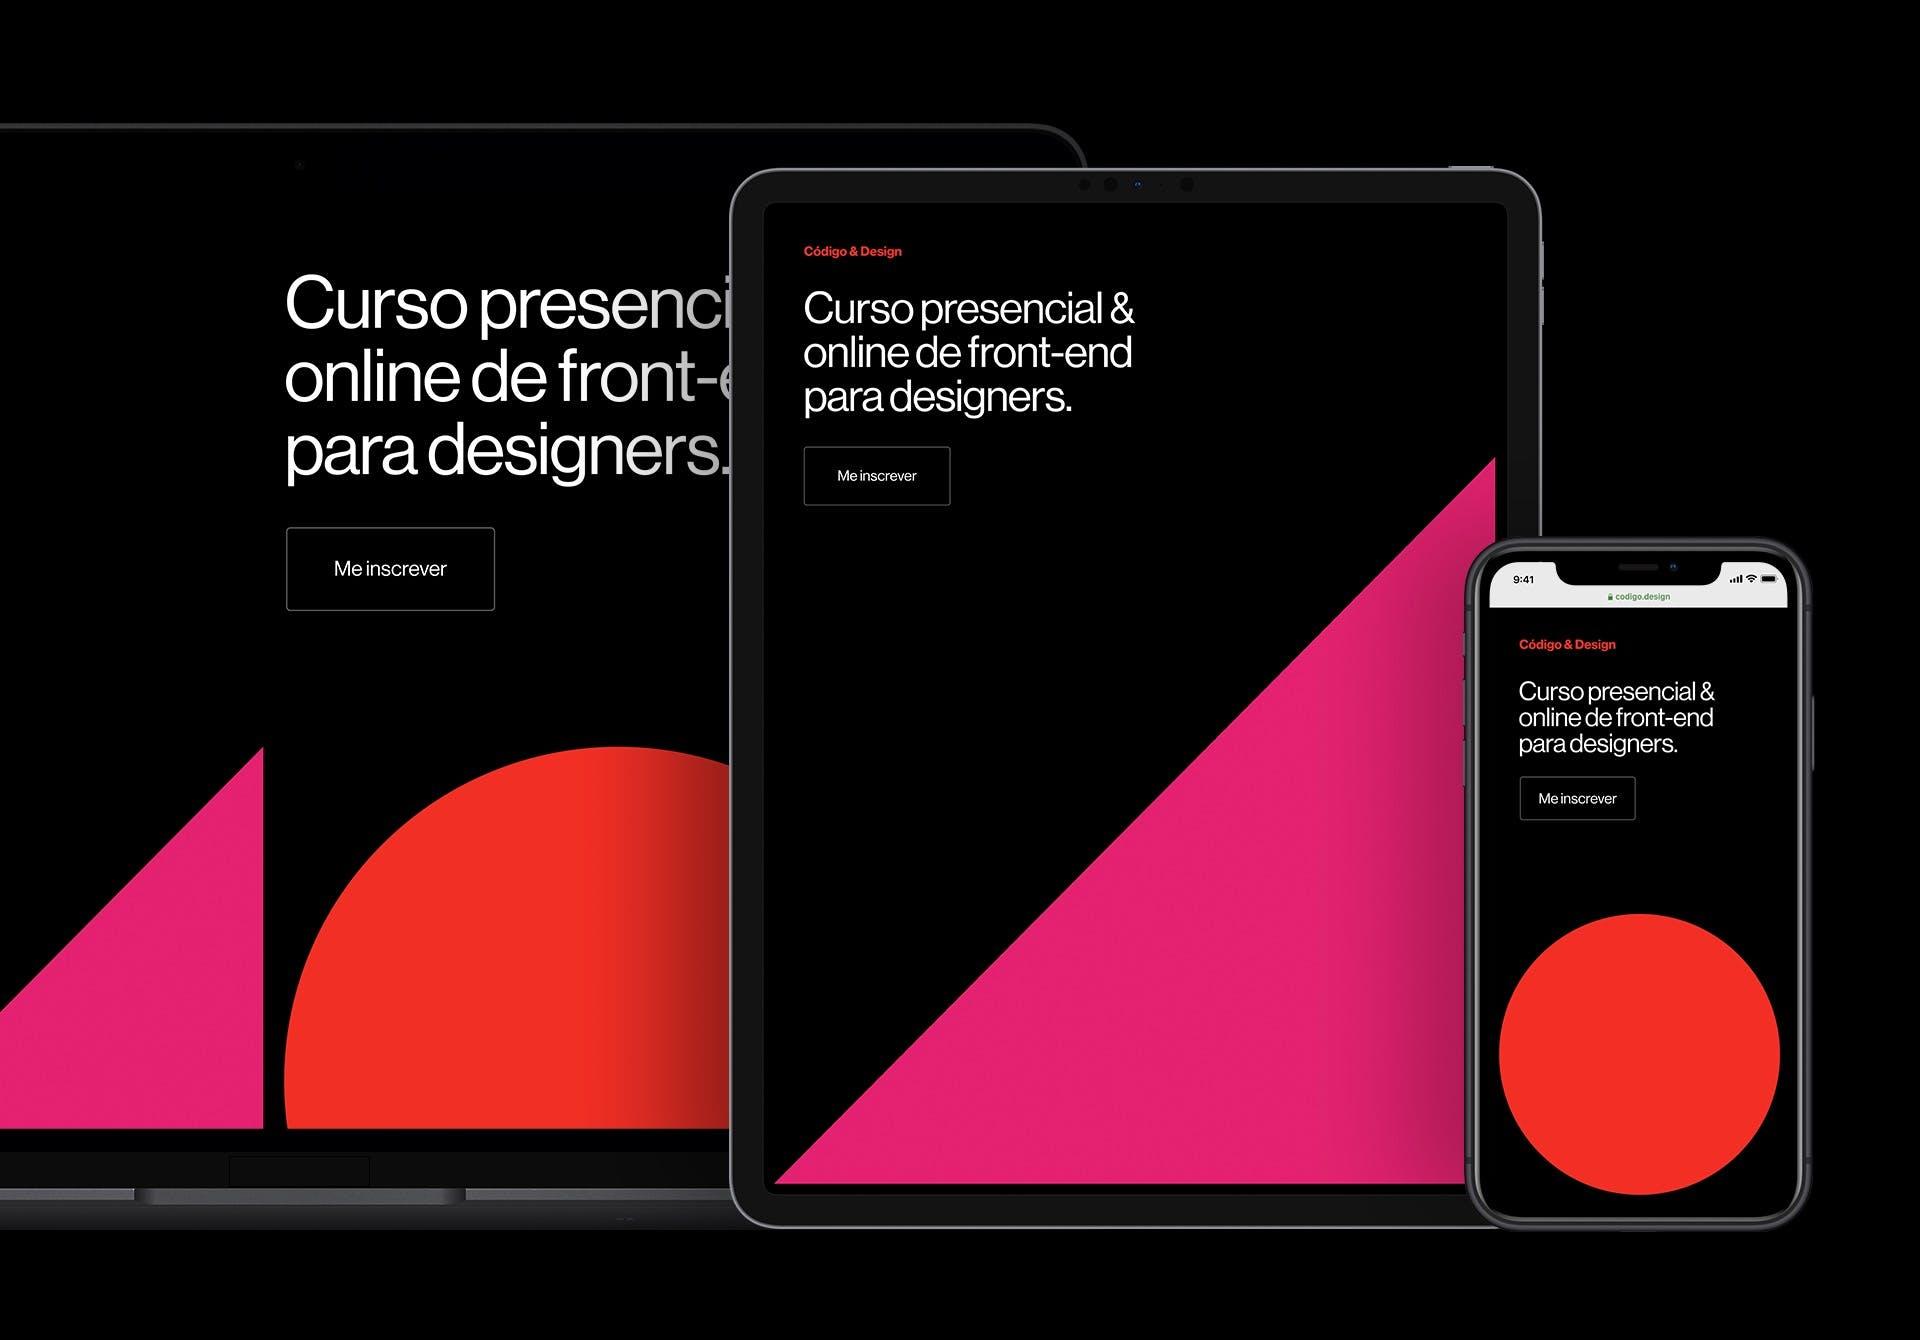 glauber-sampaio-codigo-design-4.jpeg